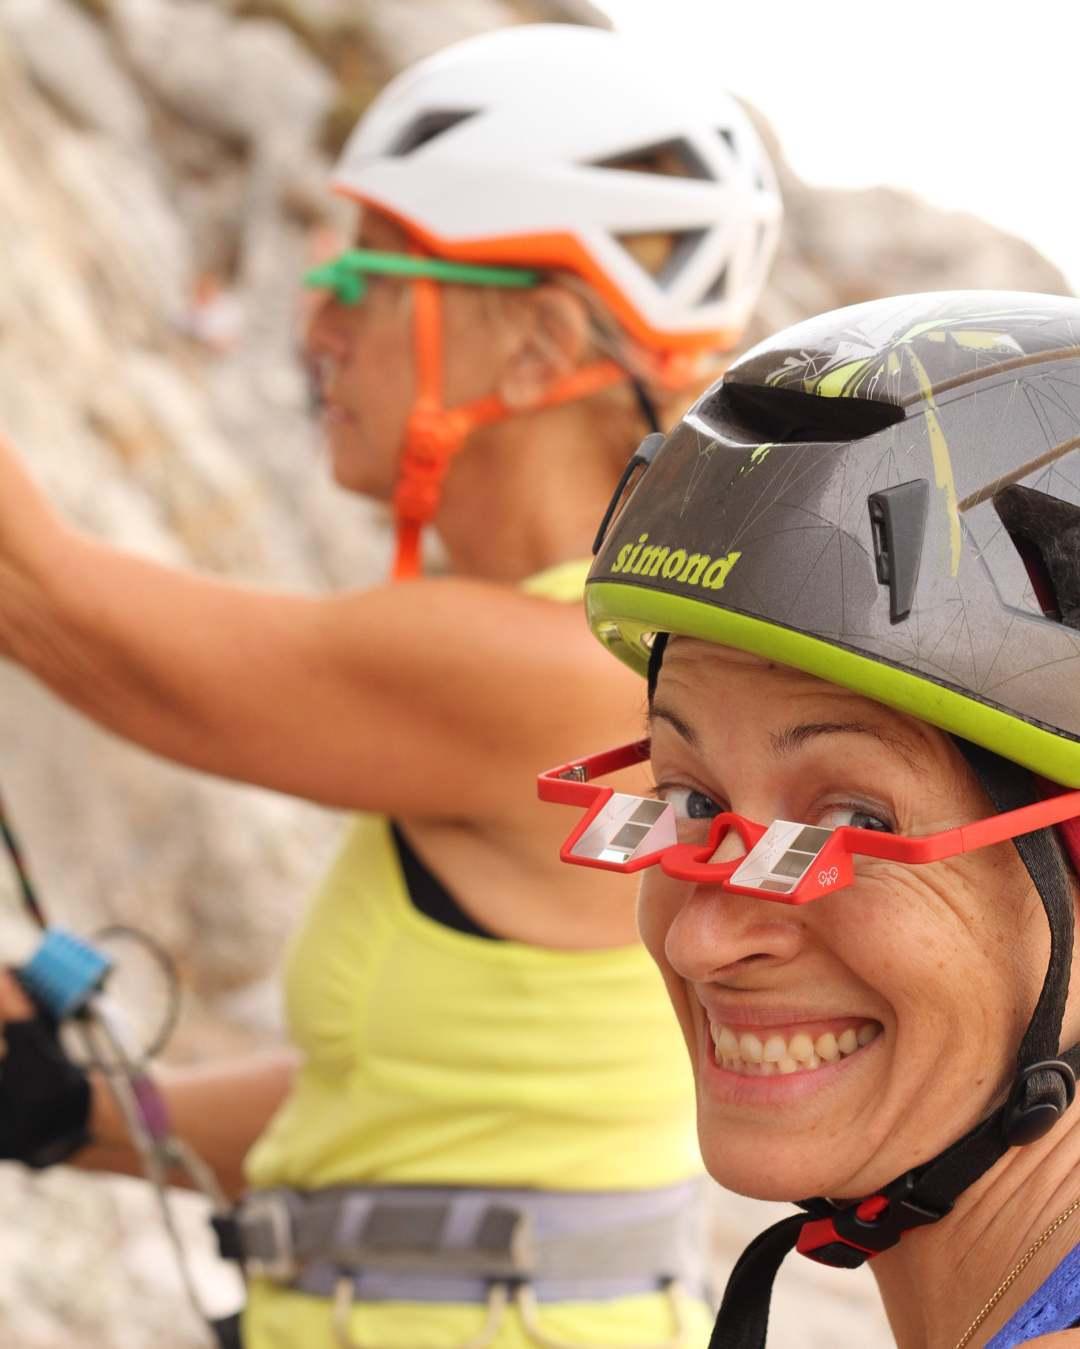 thetravelingclimber